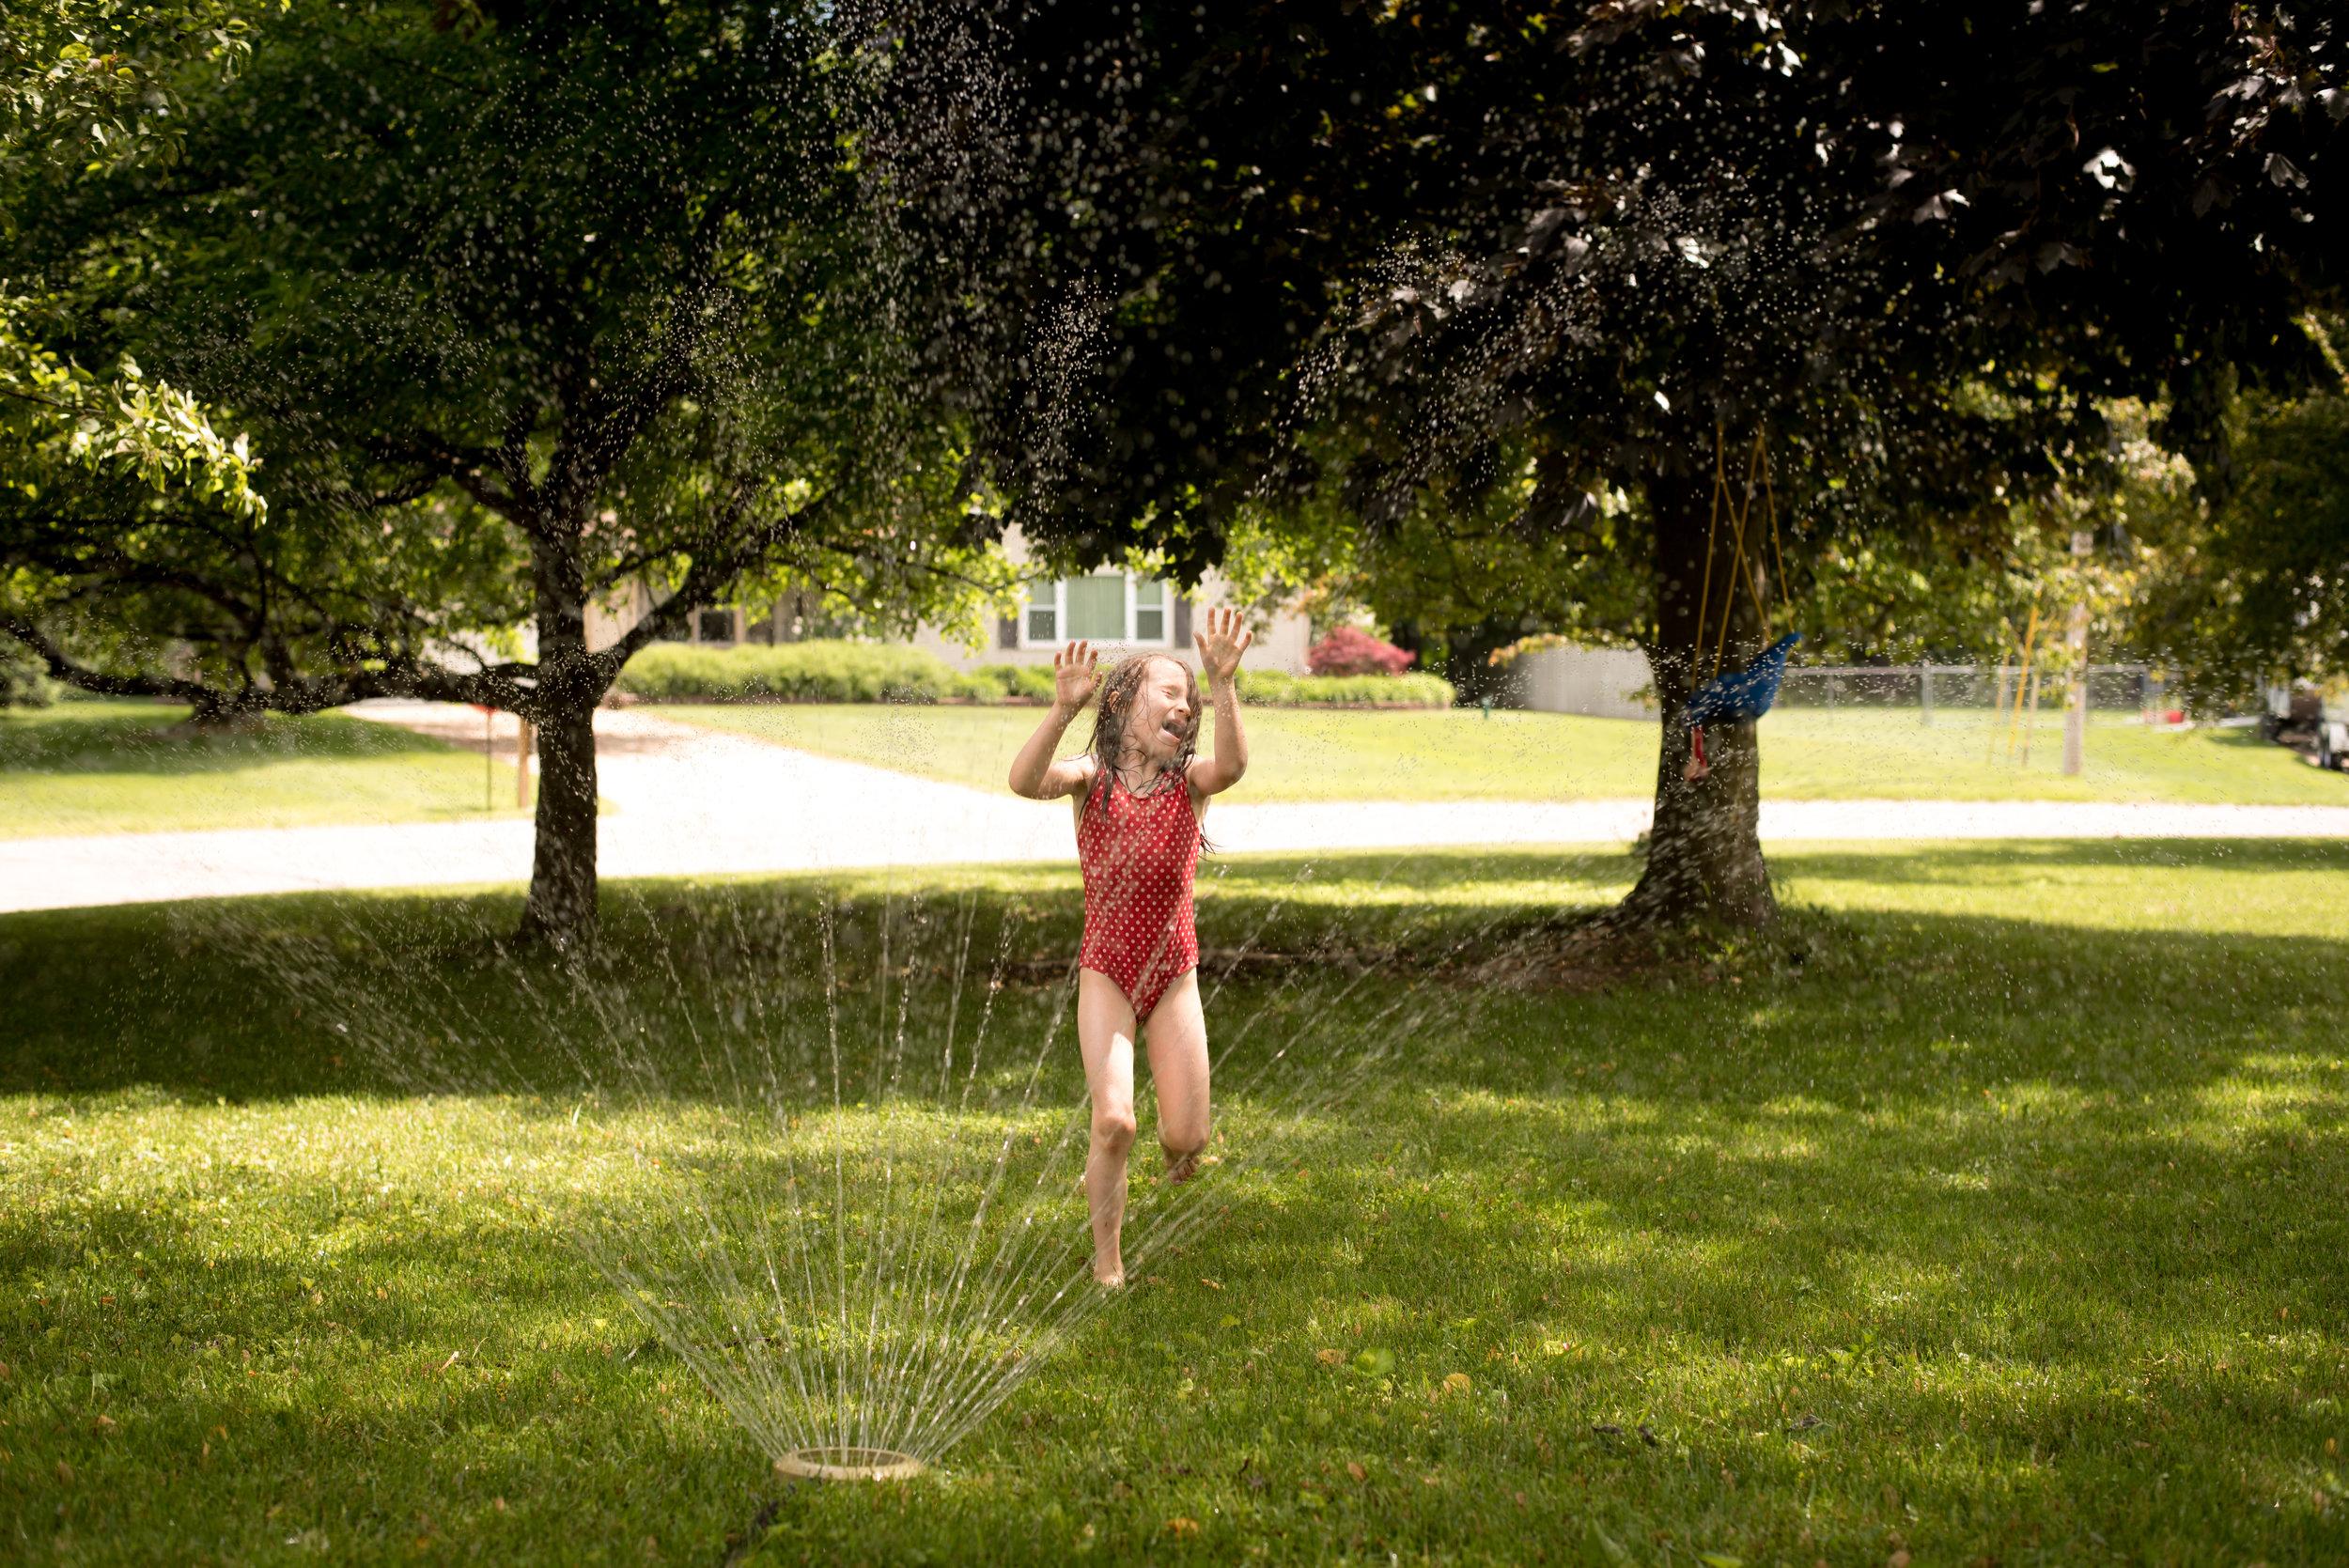 Summer Fun Days